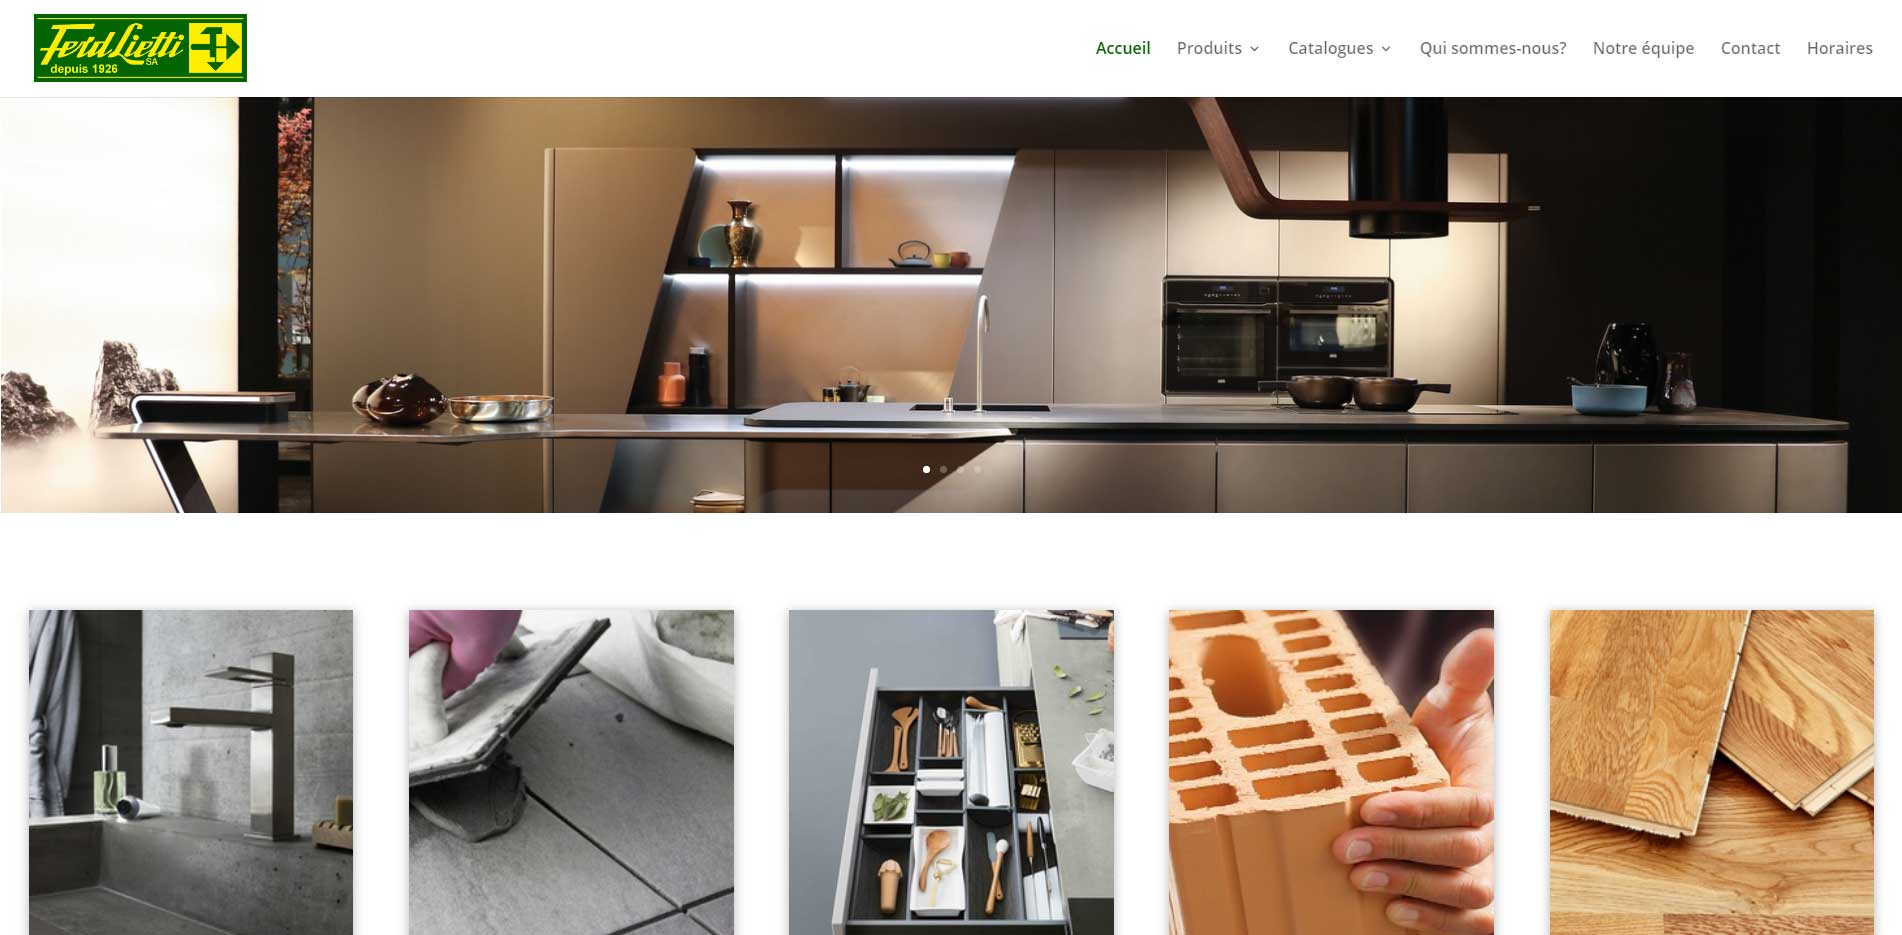 Lietti homepage